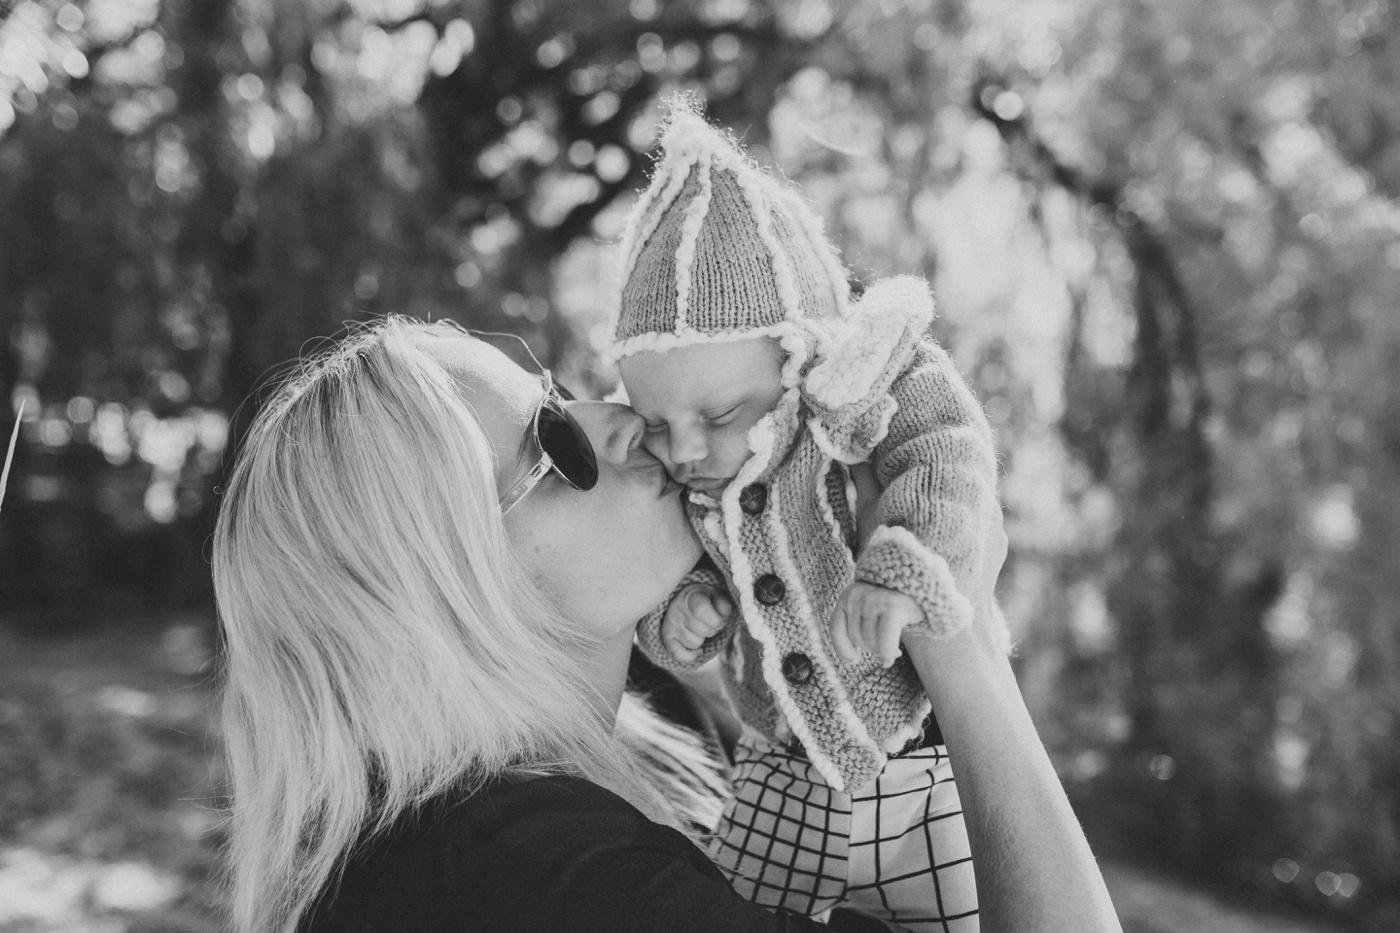 Blake-Lily-Rolig-Lekfull-Familjesession-Familjefotograf-Stockholm-Orebro_16